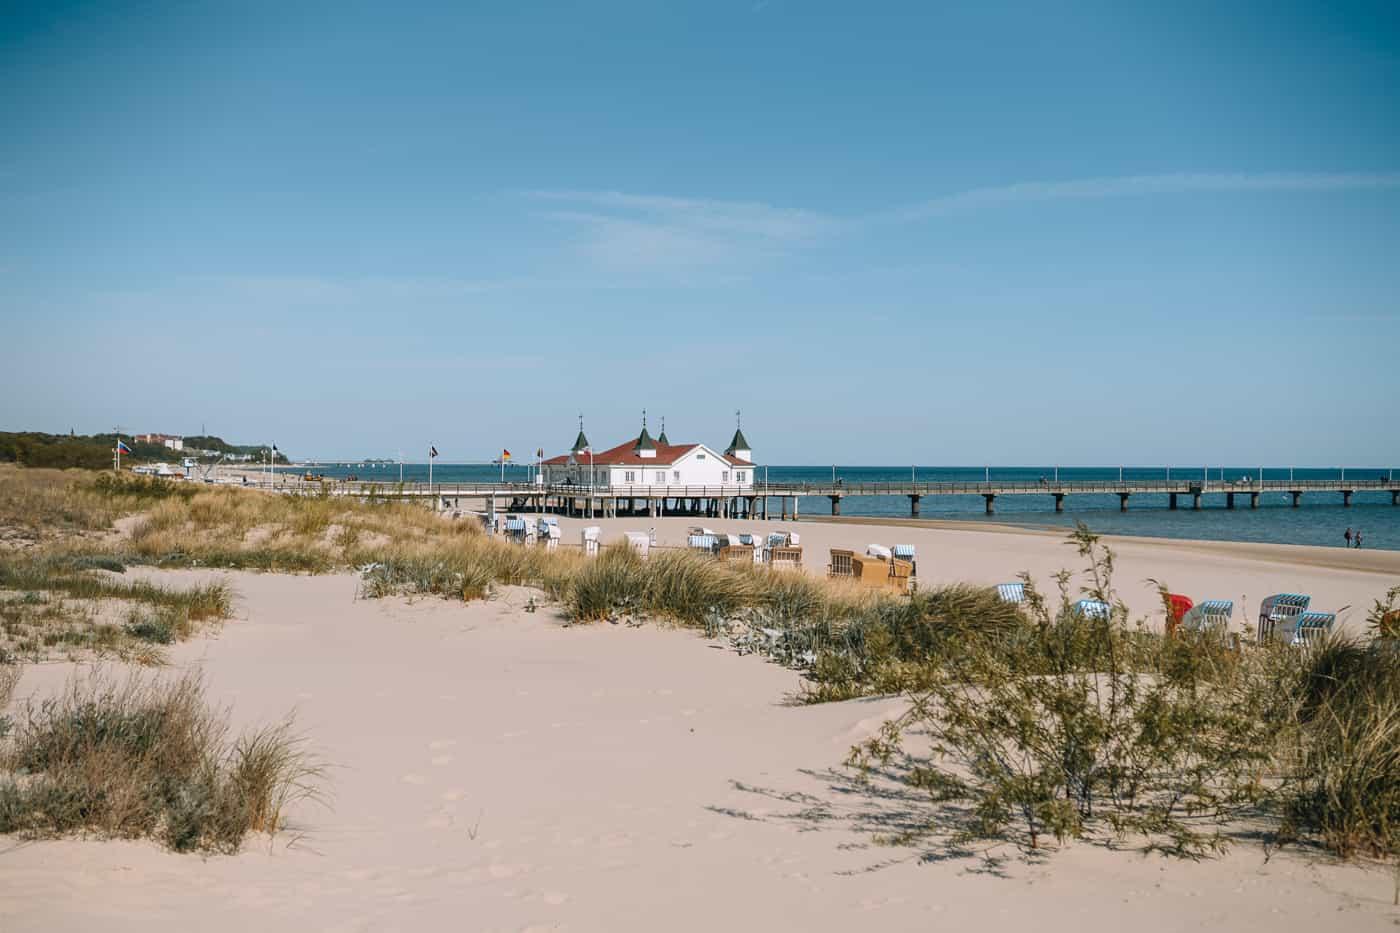 Usedom mit Hund - Kaiserbad Ahlbeck: Strand und Seebrücke